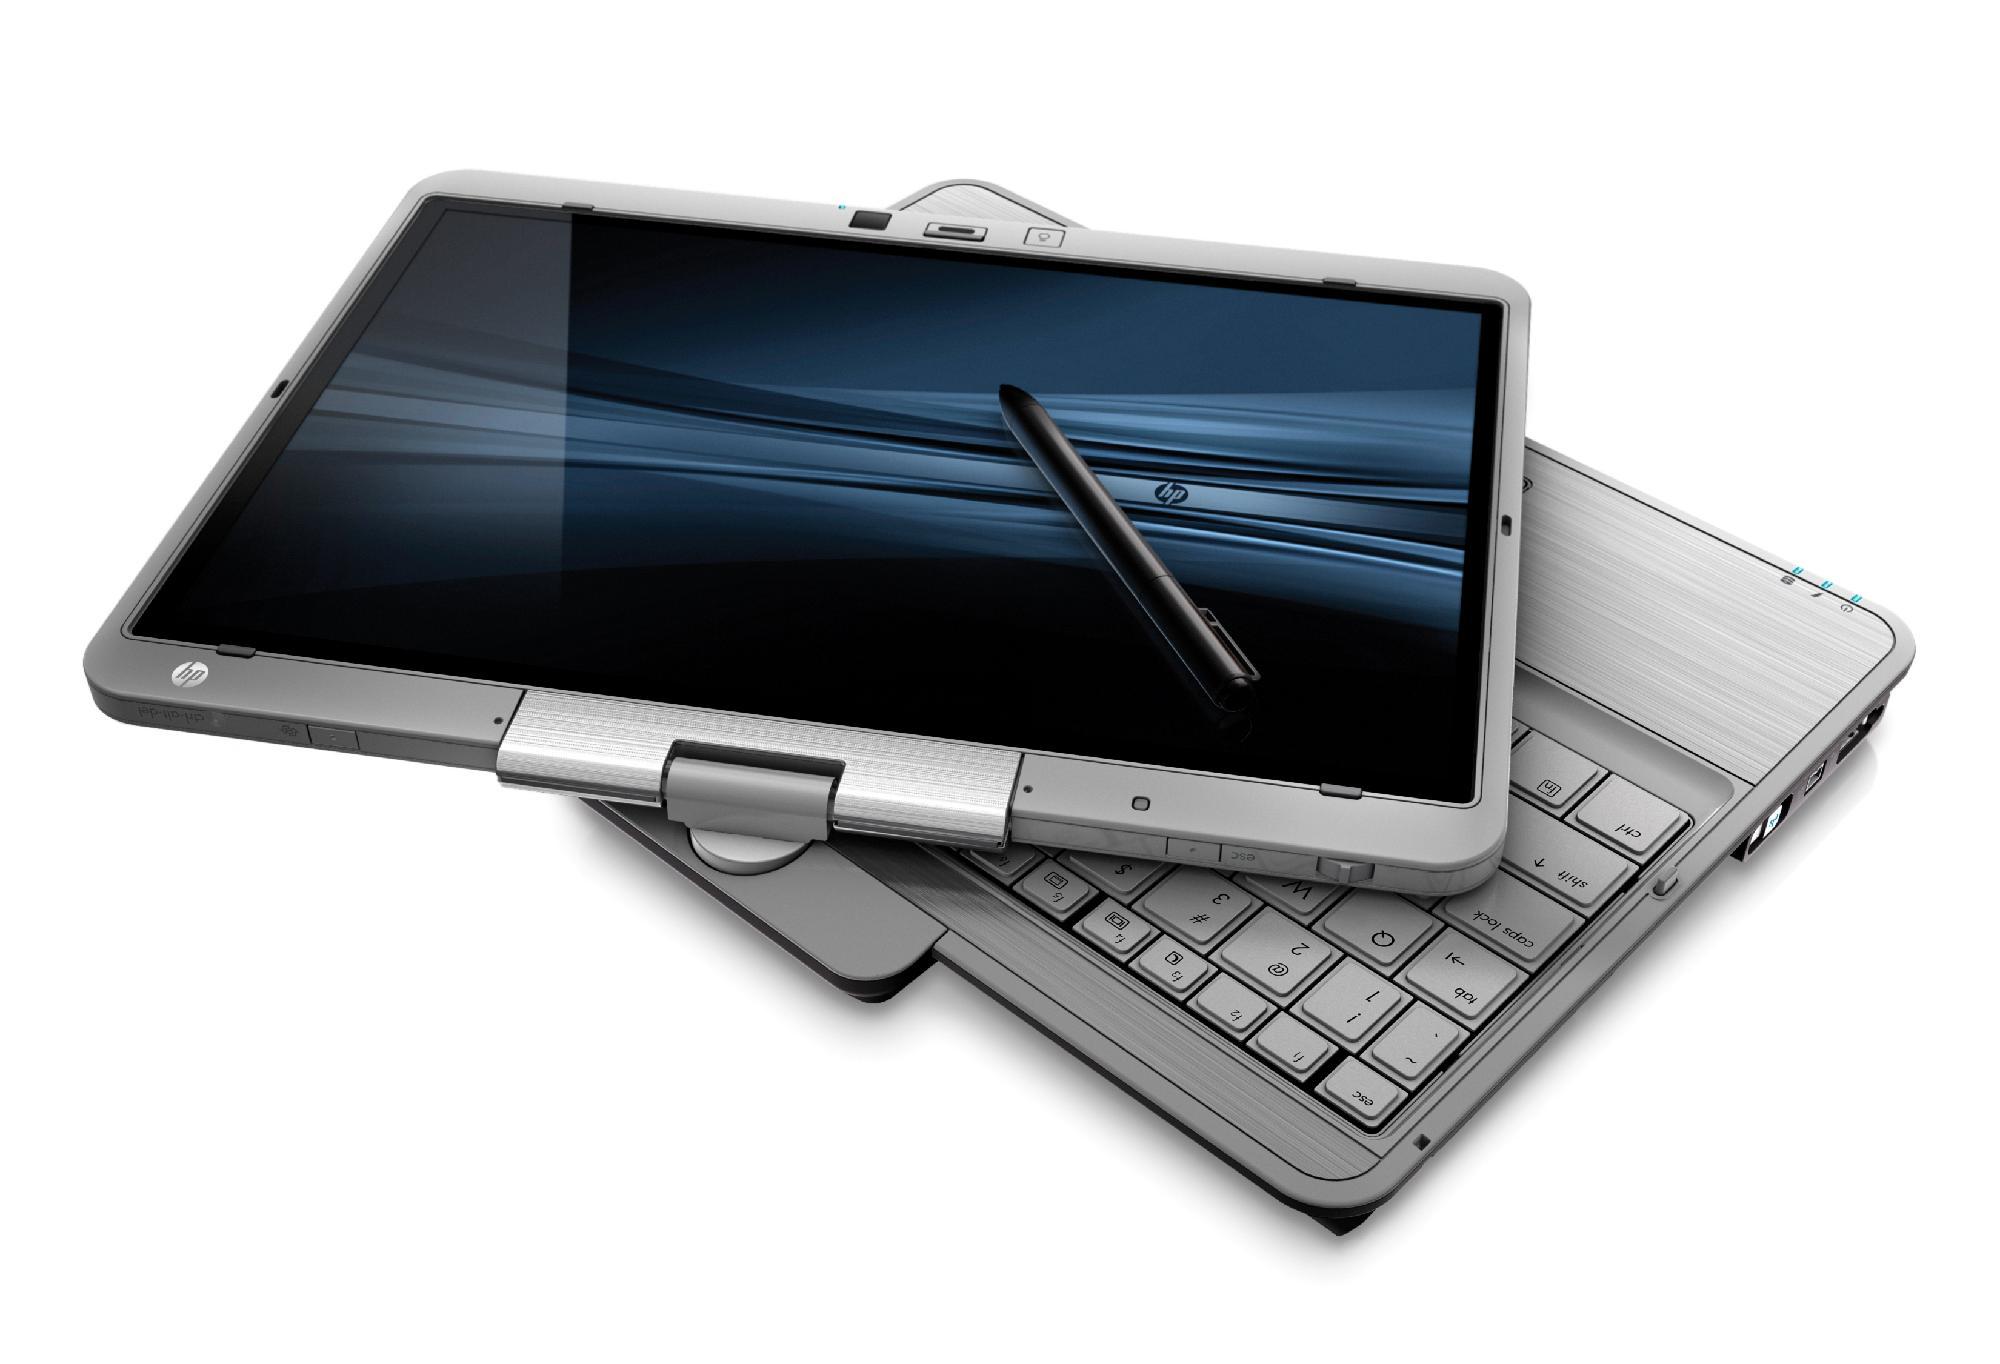 "HP **Refurbished** HP EliteBook 2740P 12.1"" Tablet PC - Intel Core i5 2.5GHz 4GB 160GB Win 7"